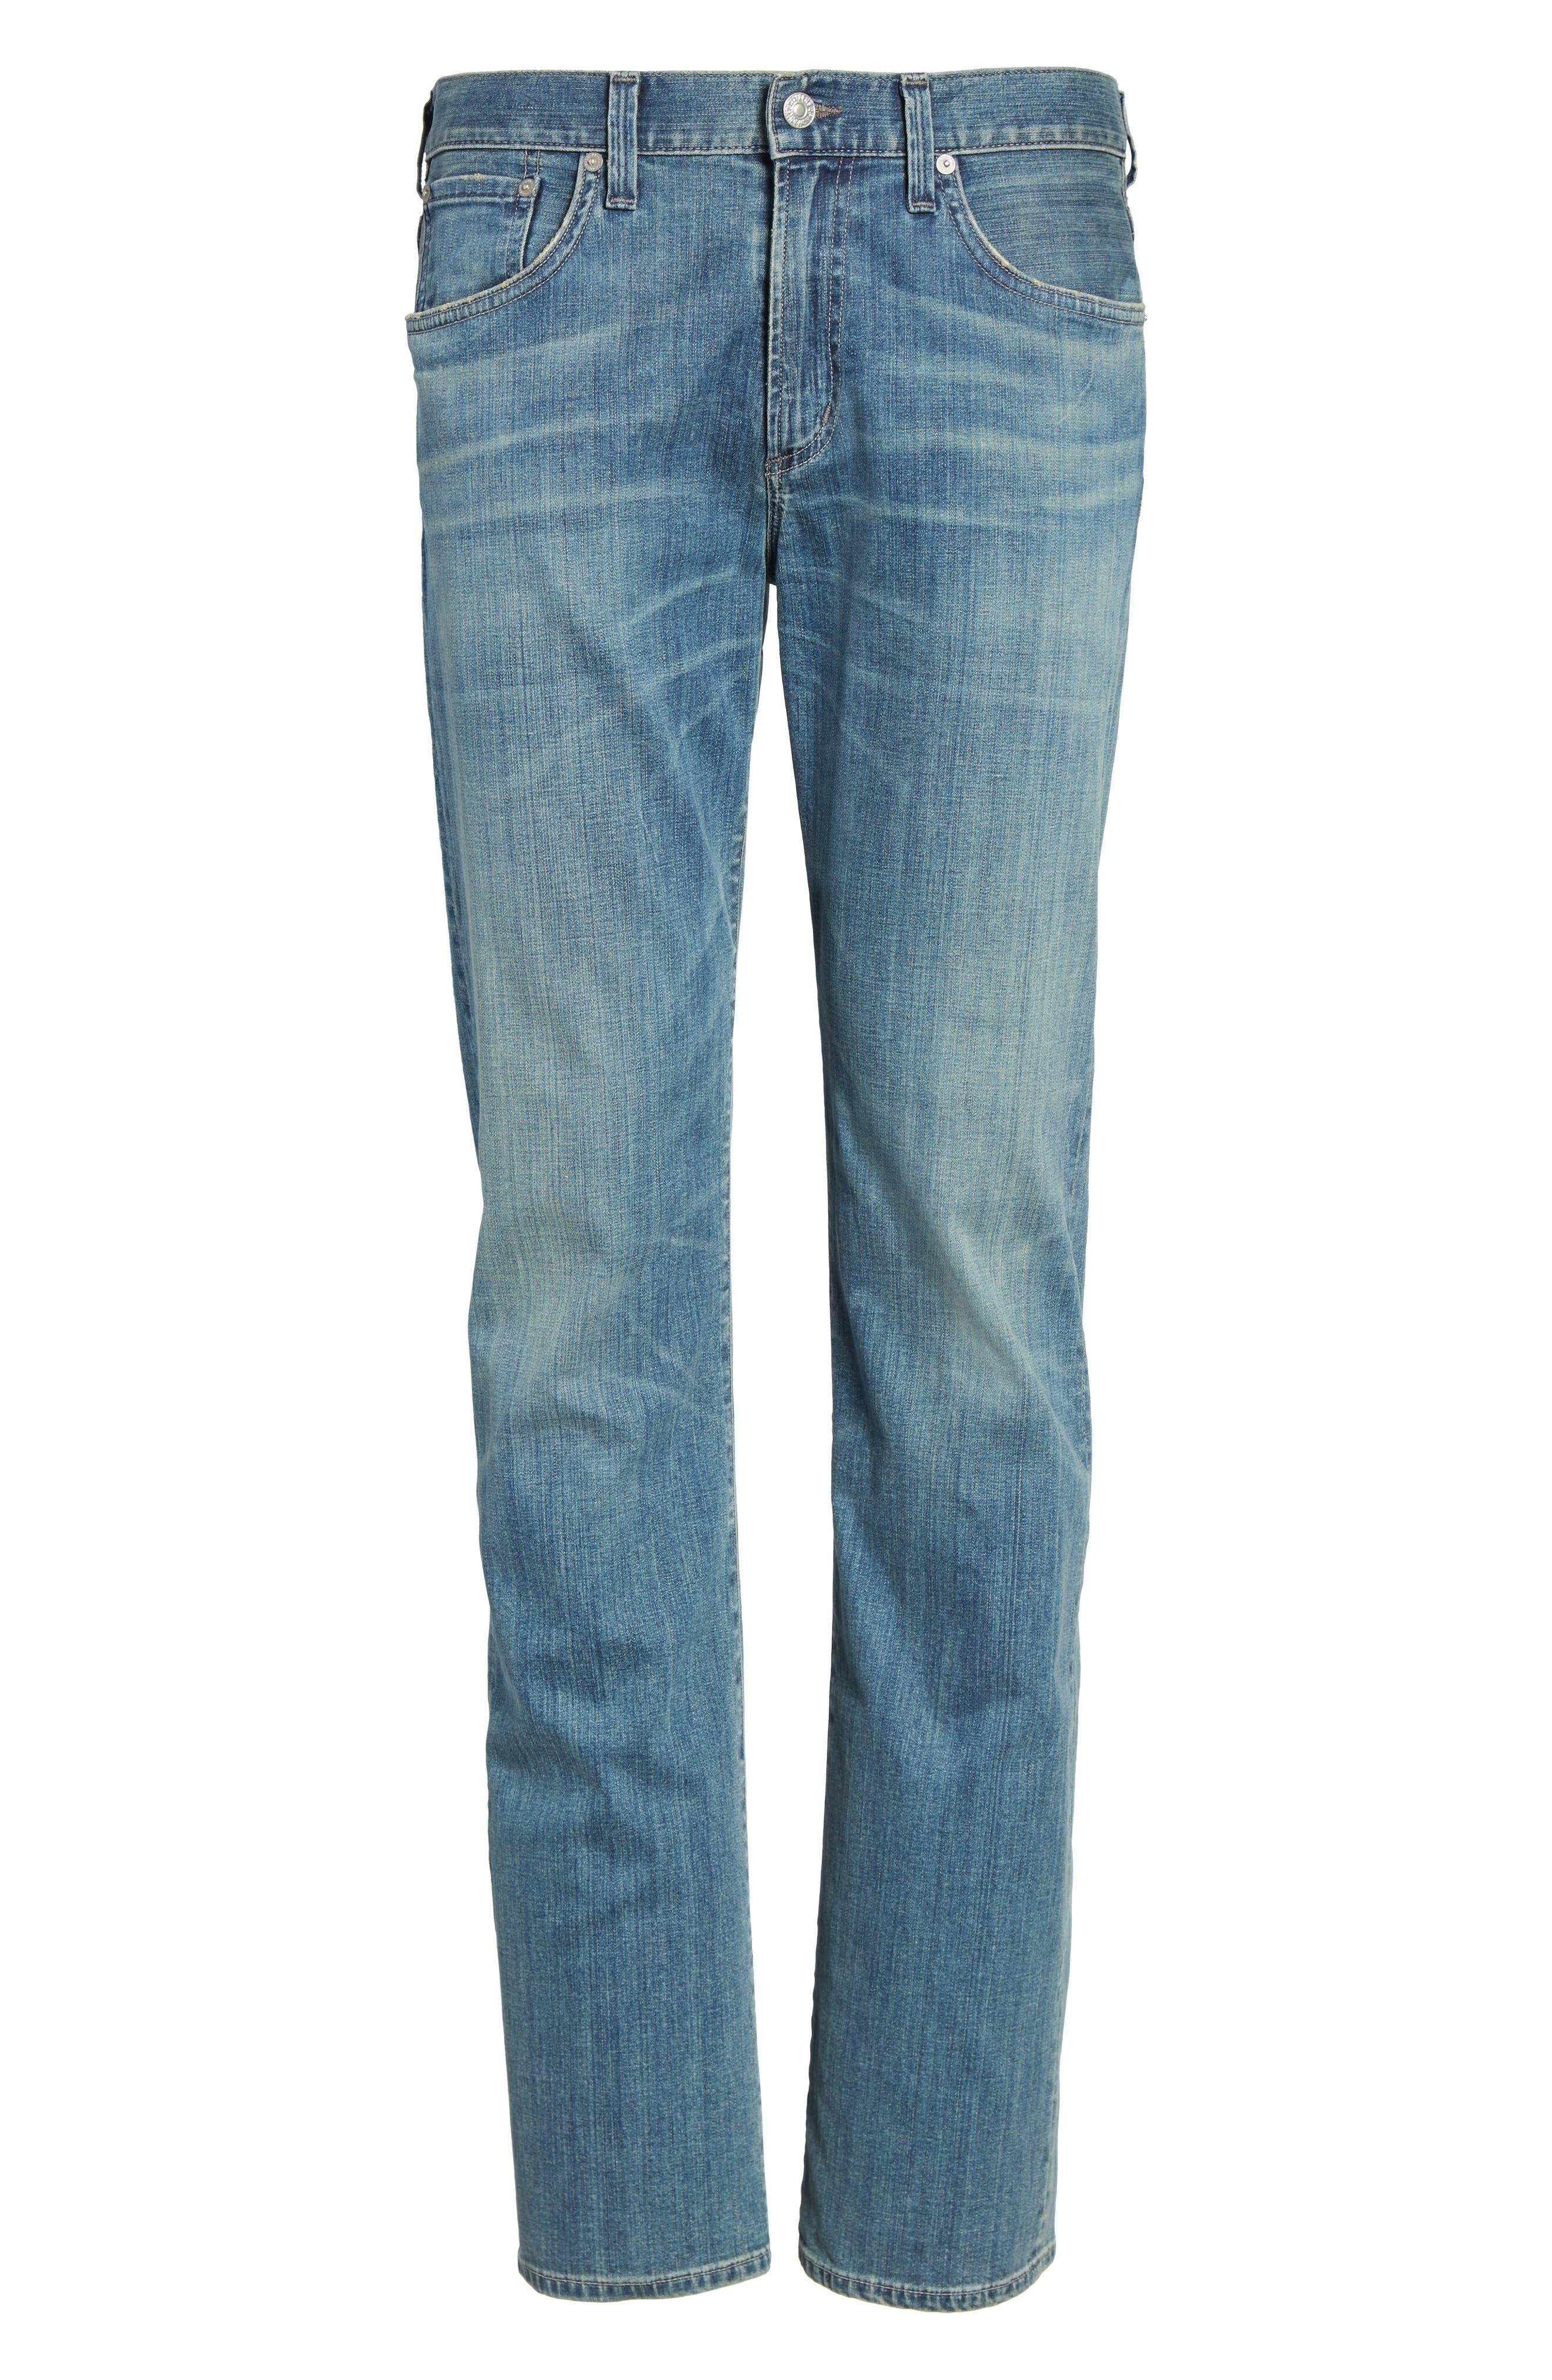 Sid Straight Leg Jeans,                             Alternate thumbnail 6, color,                             423